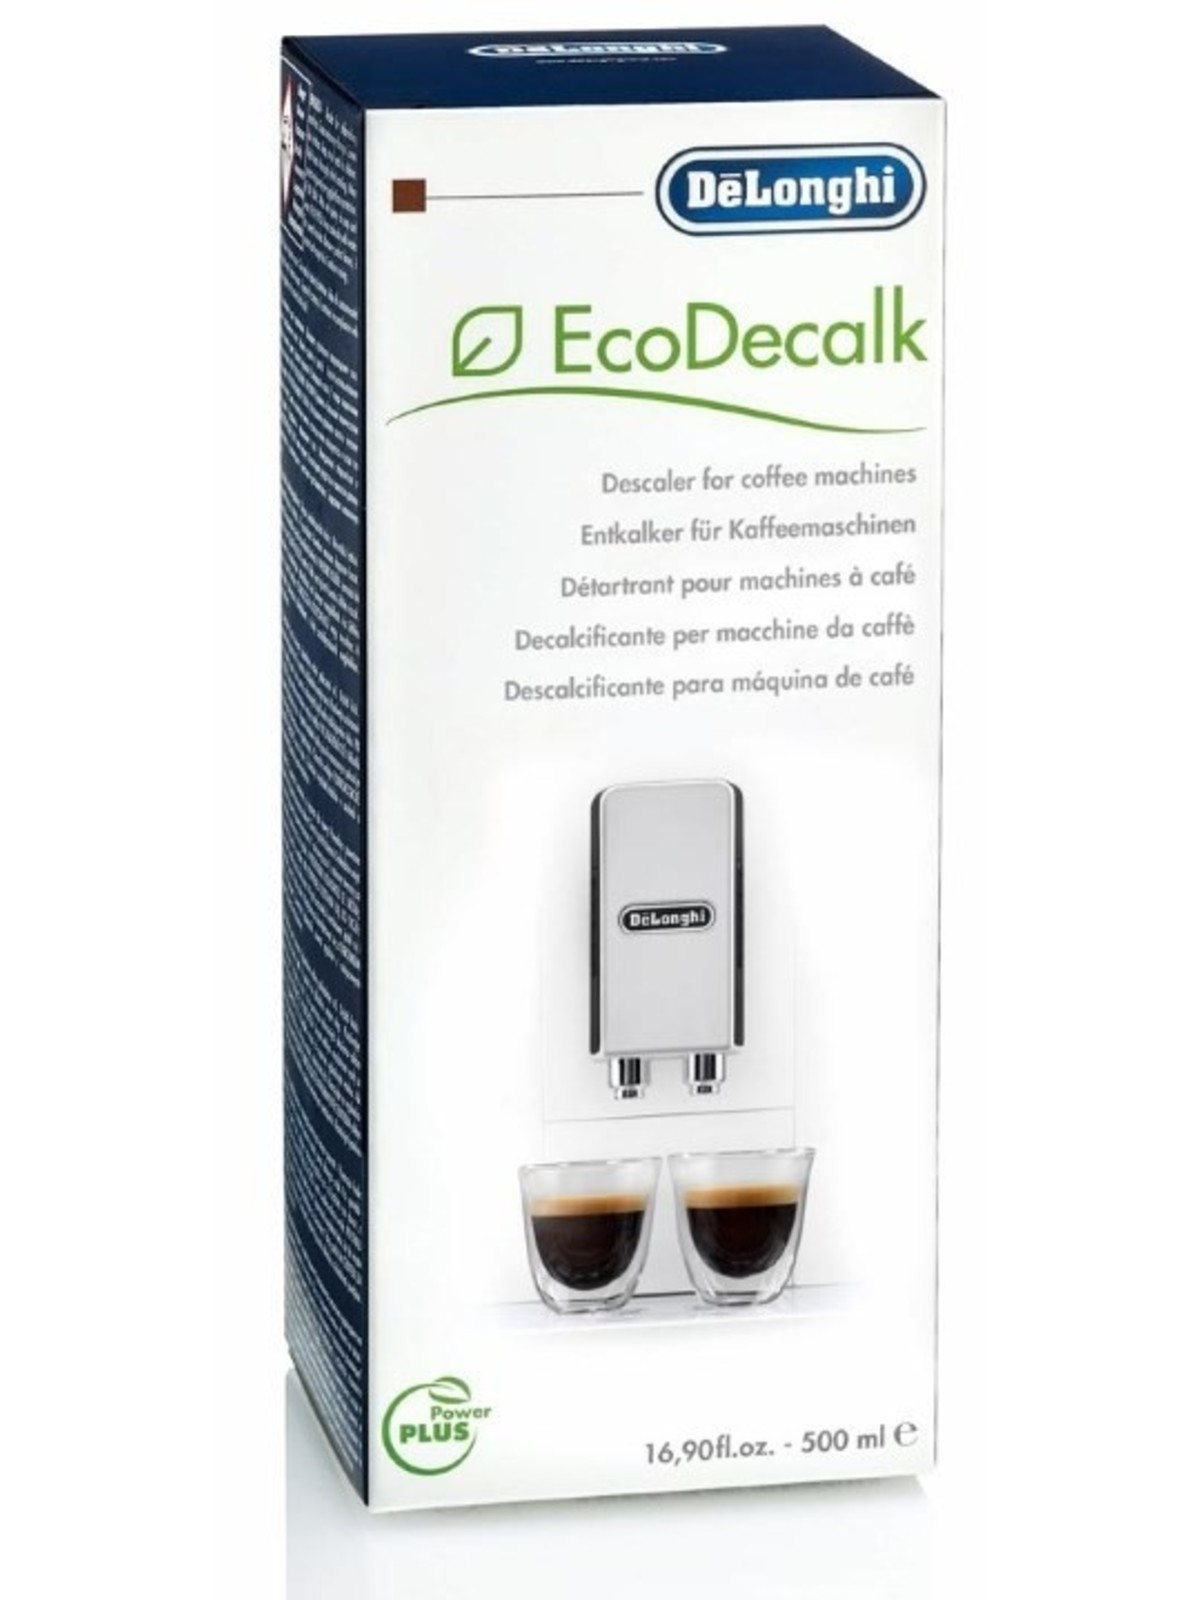 DELONGHI SER3018 Coffee Machine Descaler (500 ml)